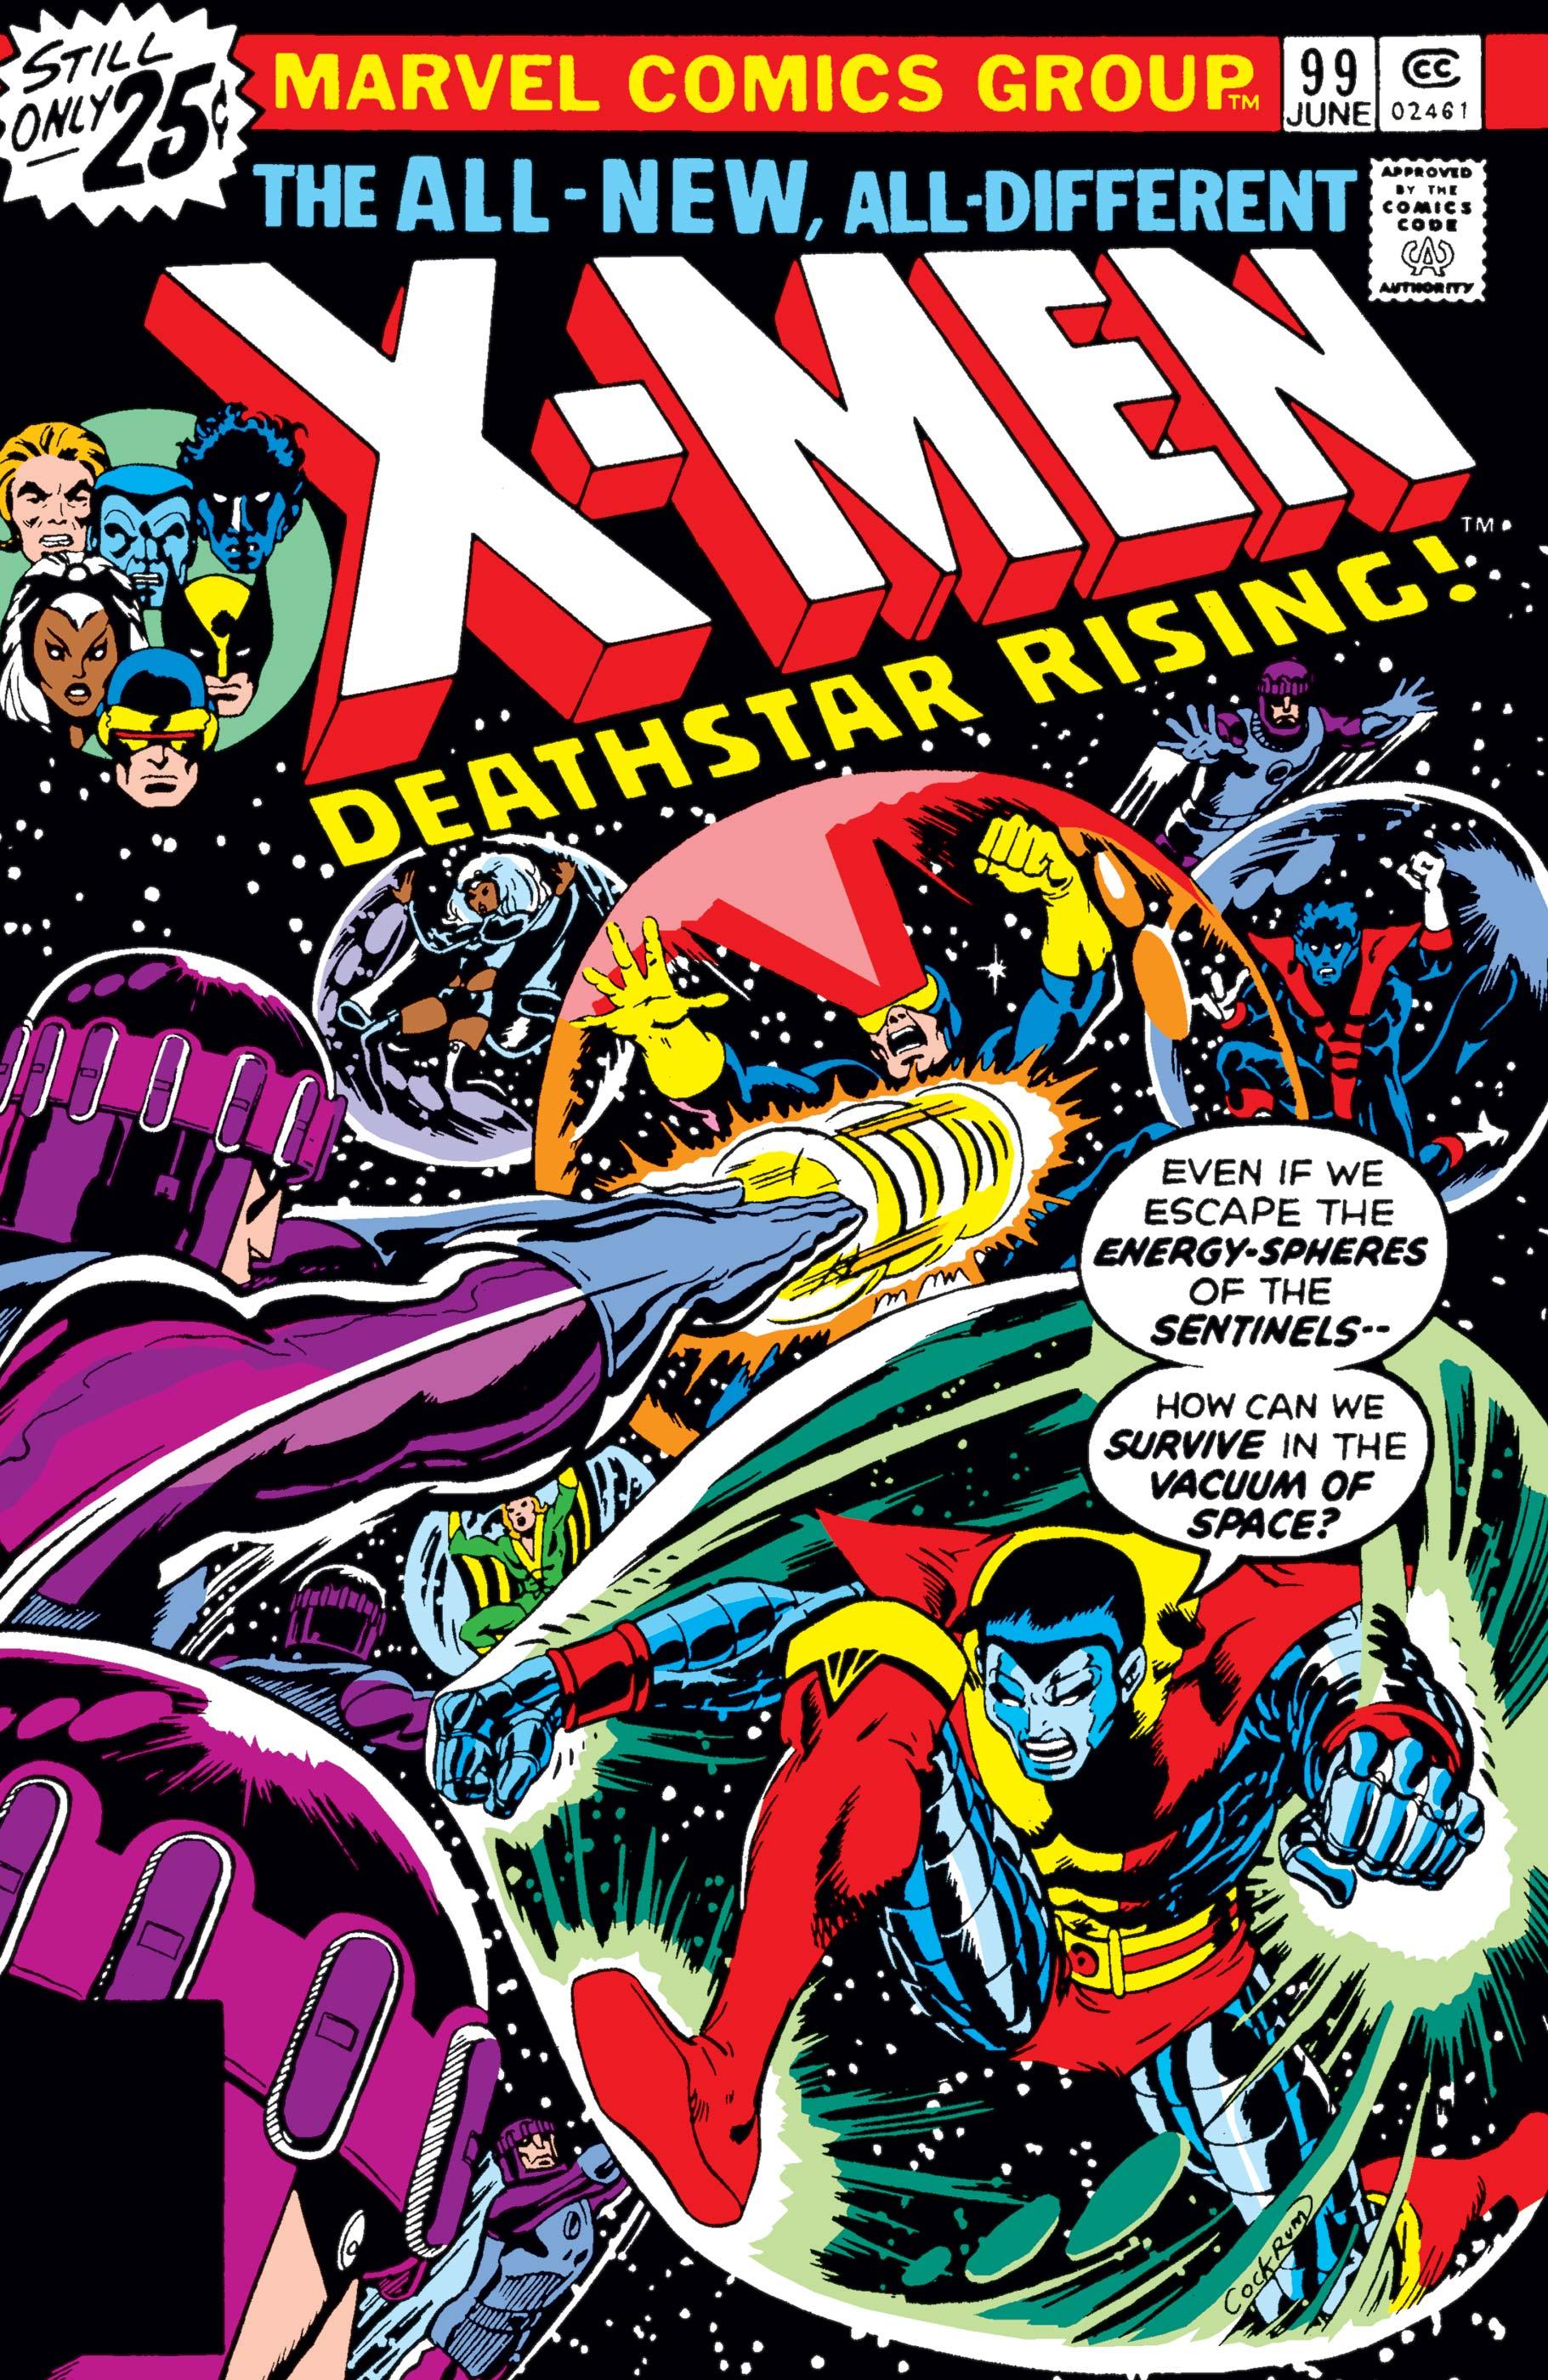 Uncanny X-Men (1963) #99